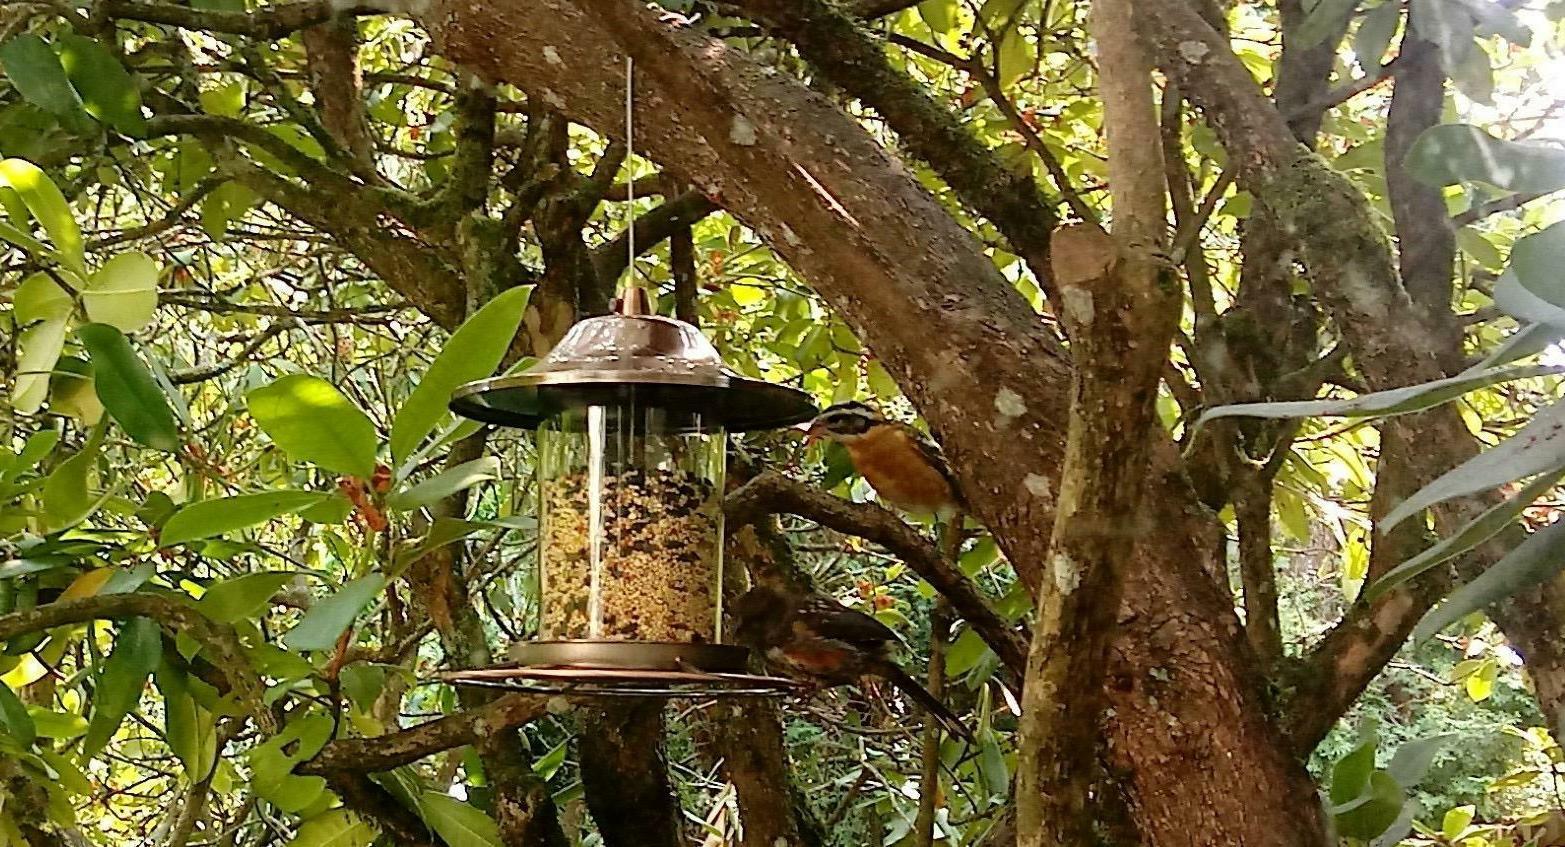 Wild Bird Feeder Hangingn Outdoor Seed Food Animal